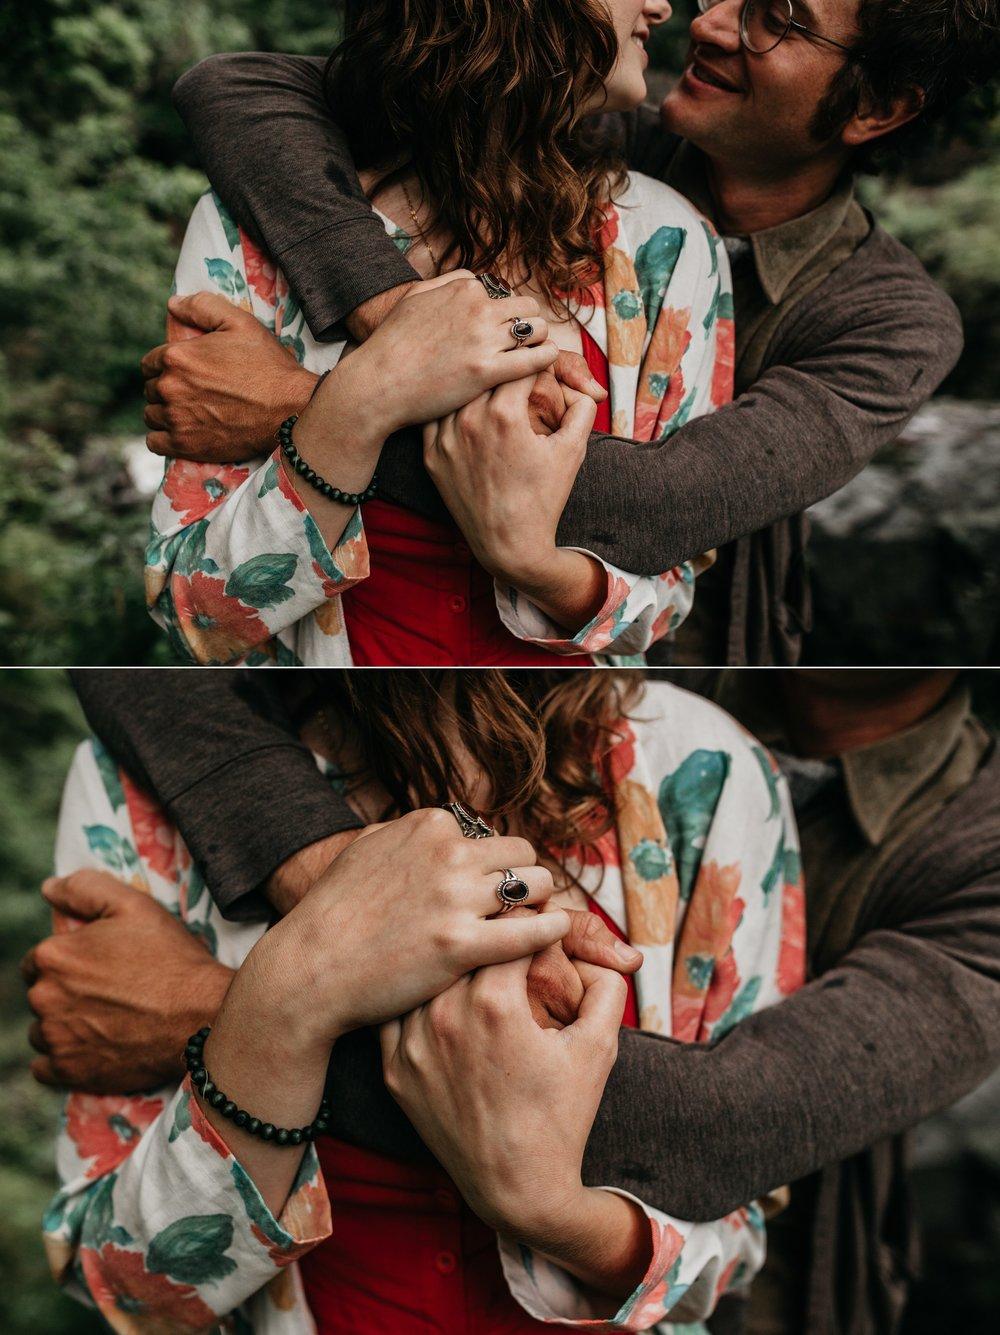 mandy aaron engagement minneapolis minnesota texas austin wedding elopement destination intimate best photographer_0102.jpg